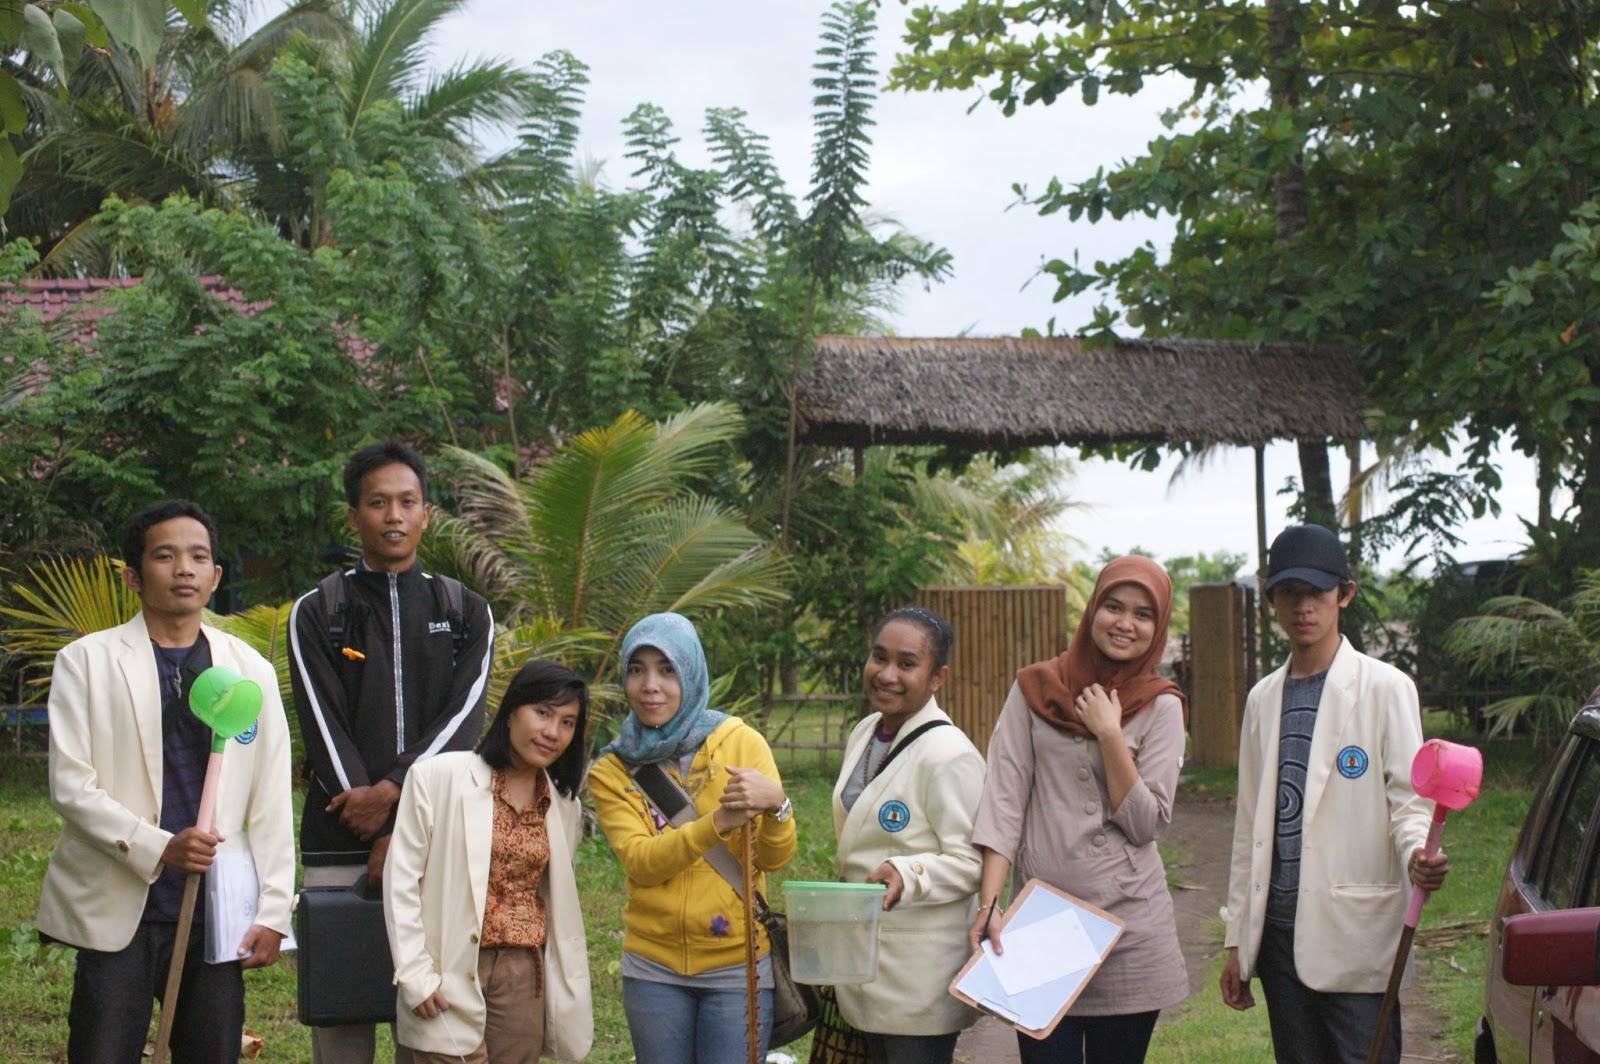 Kunjungan Wisata Ilmiah dari Mahasiswa STIKes Jenderal Ahmad Yani Cimahi